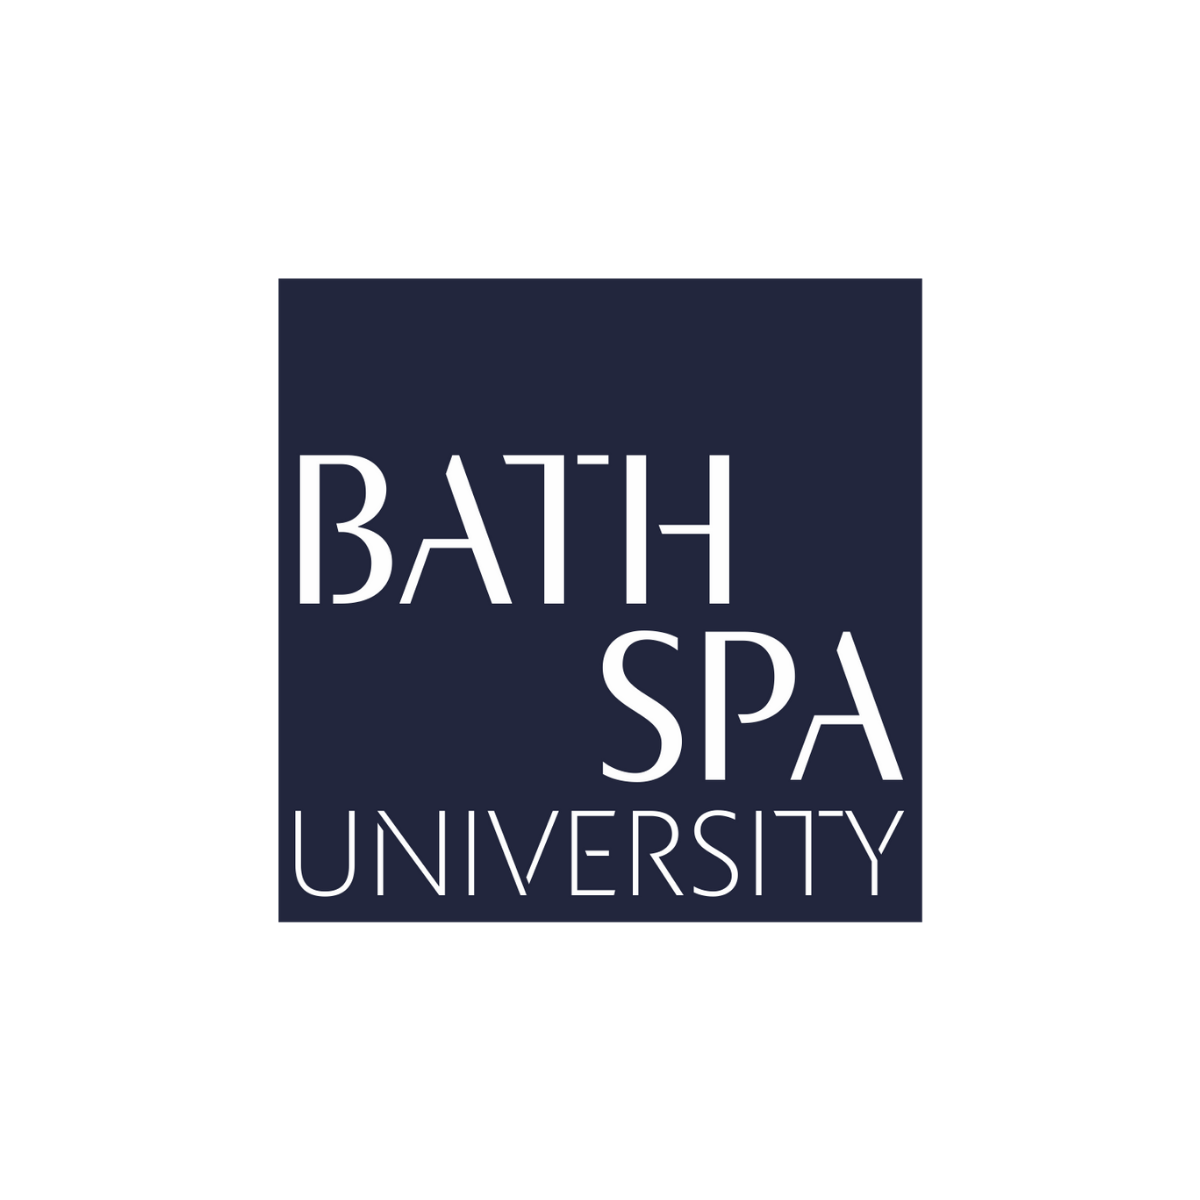 University of Bath Spa RAK Logo Image